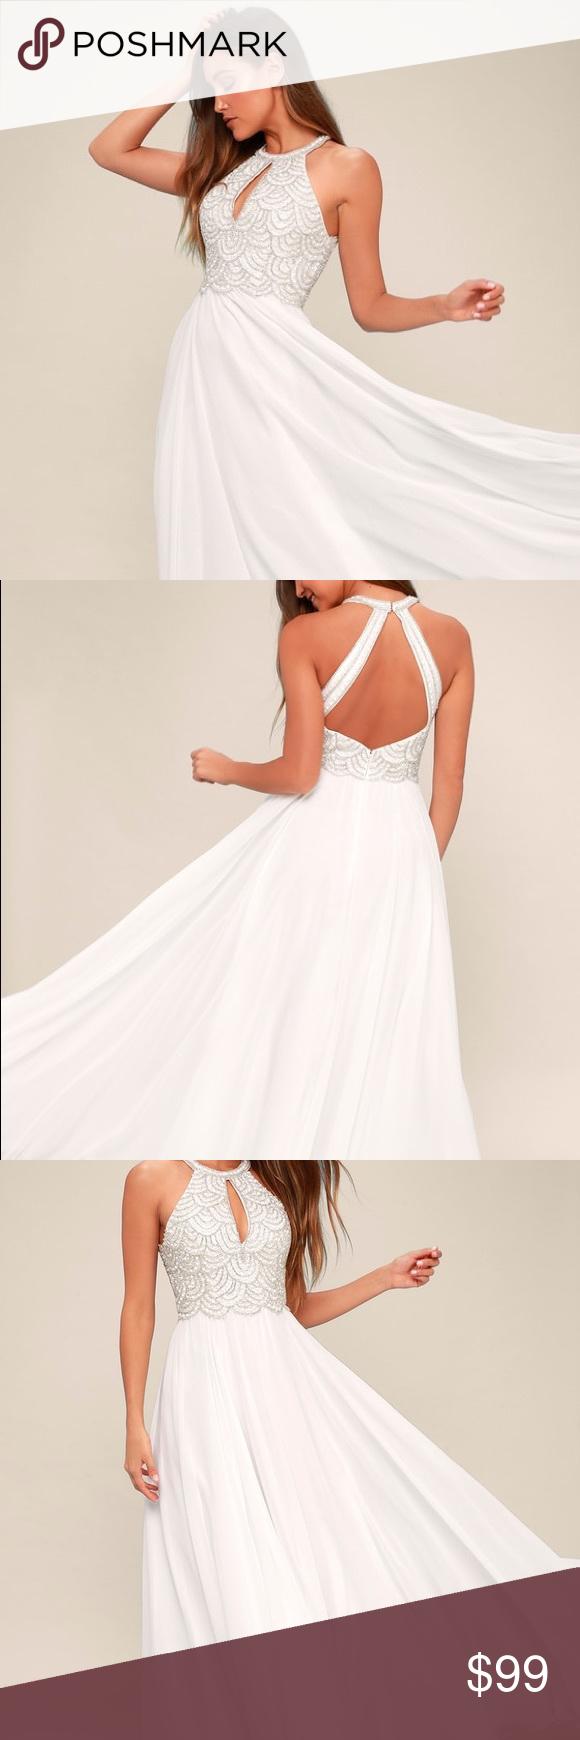 LULU'S PRINCIPESSA WHITE BEADED MAXI DRESS WEDDING Maxi